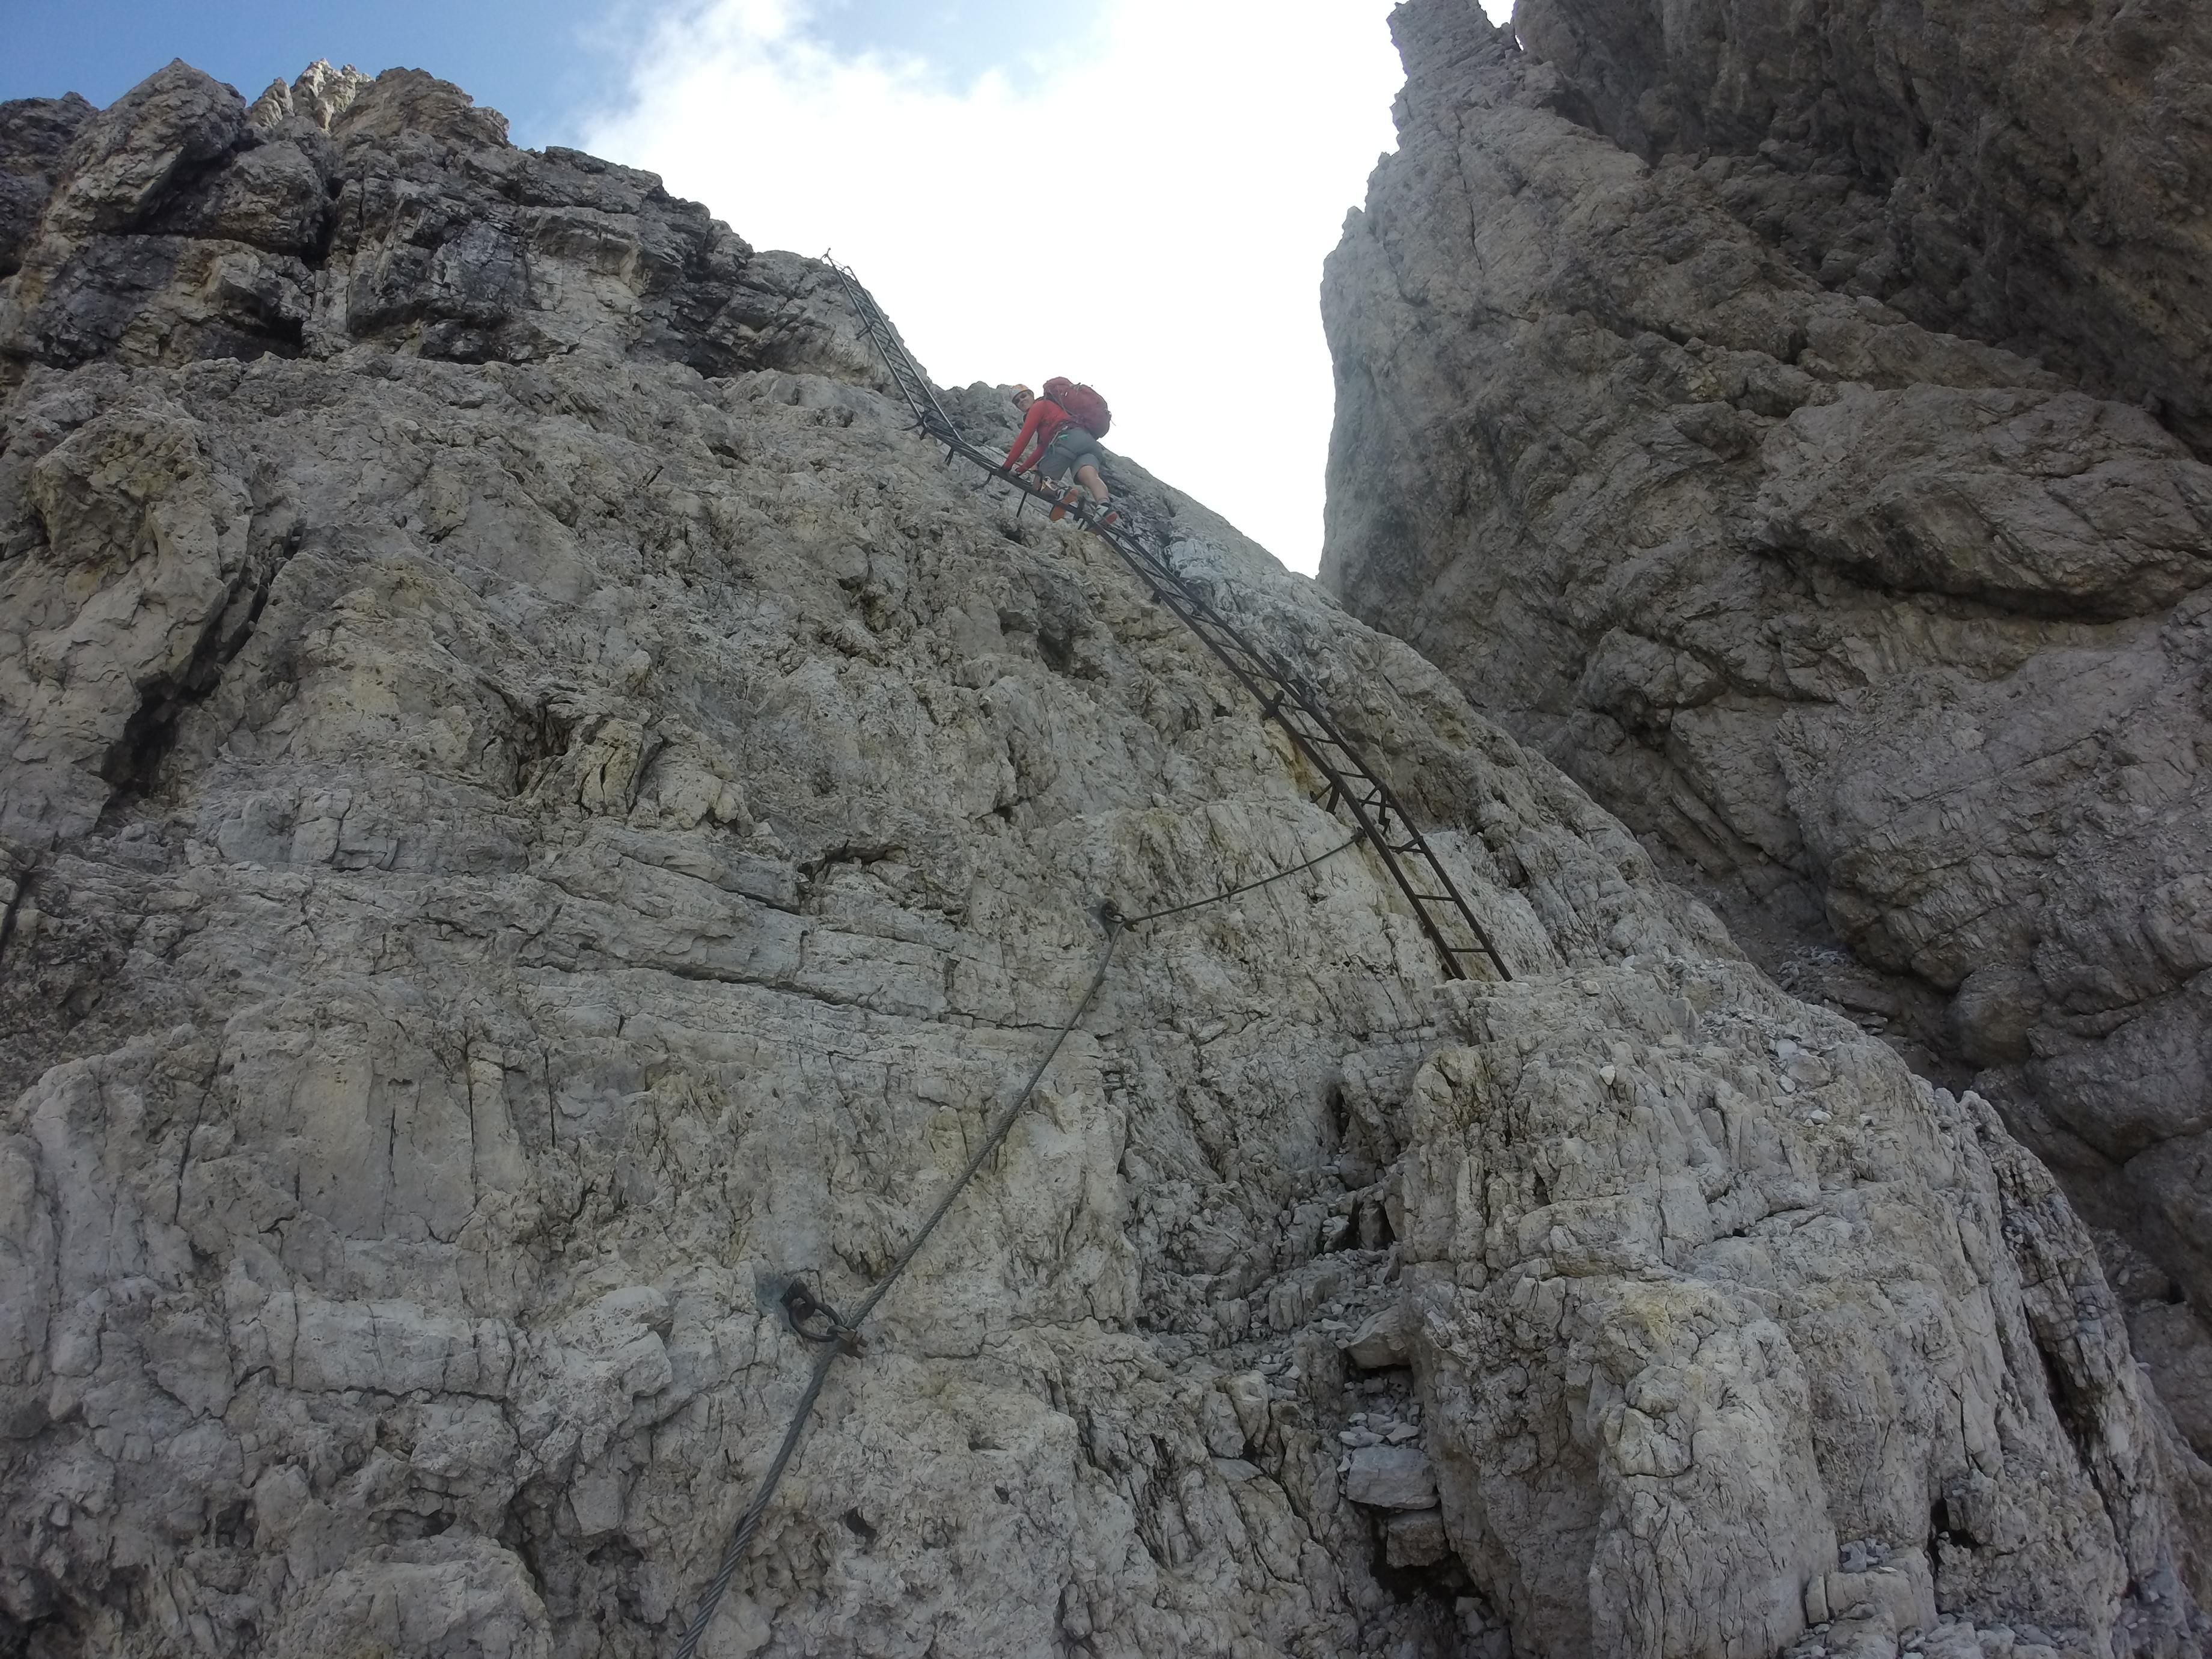 Climber using ladder on Via Ferrata